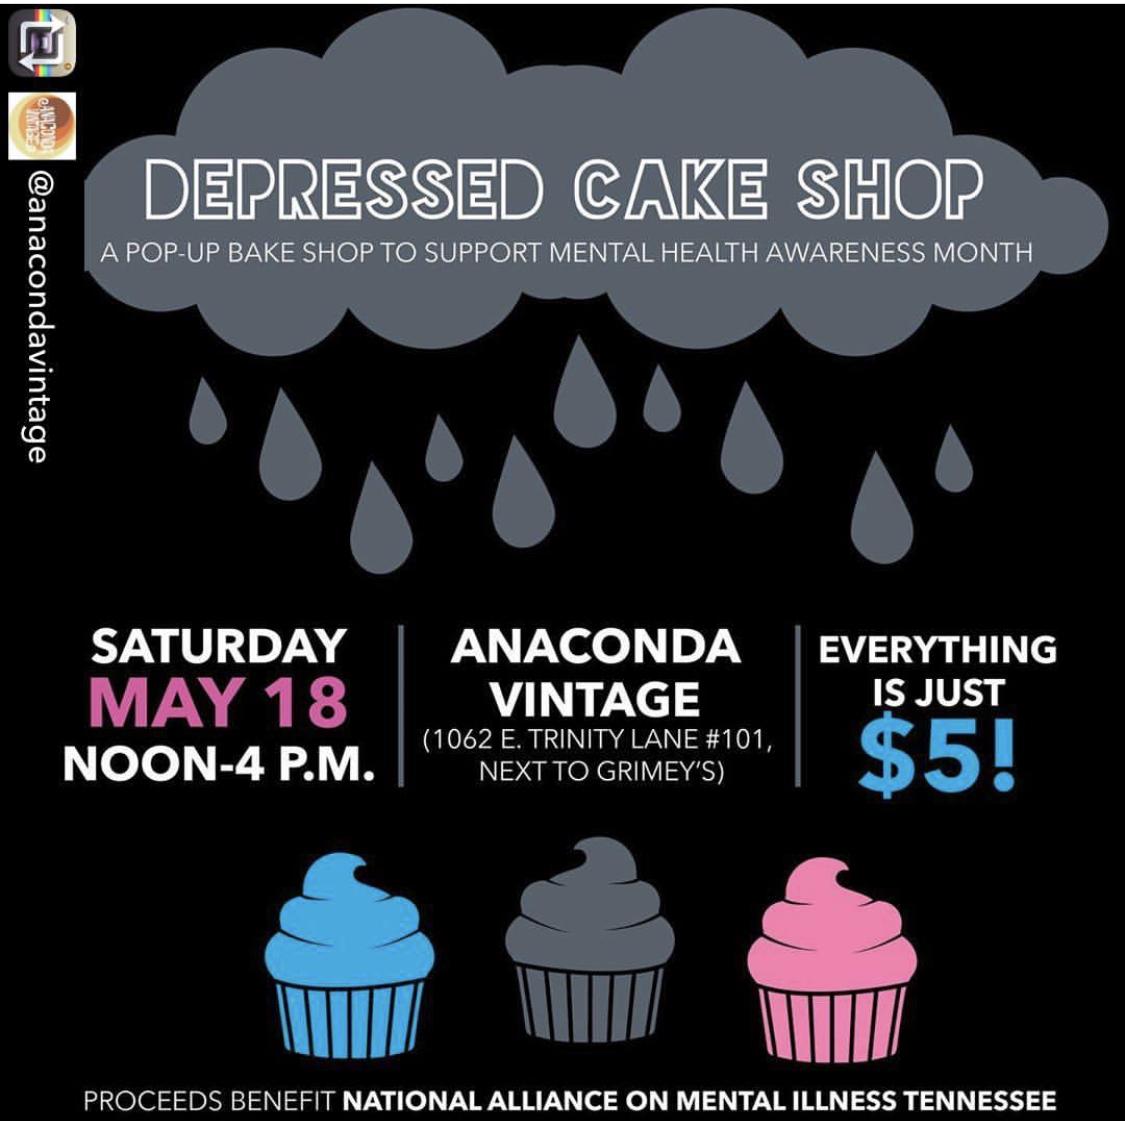 Depressed Cake Shop — depressed cake shop